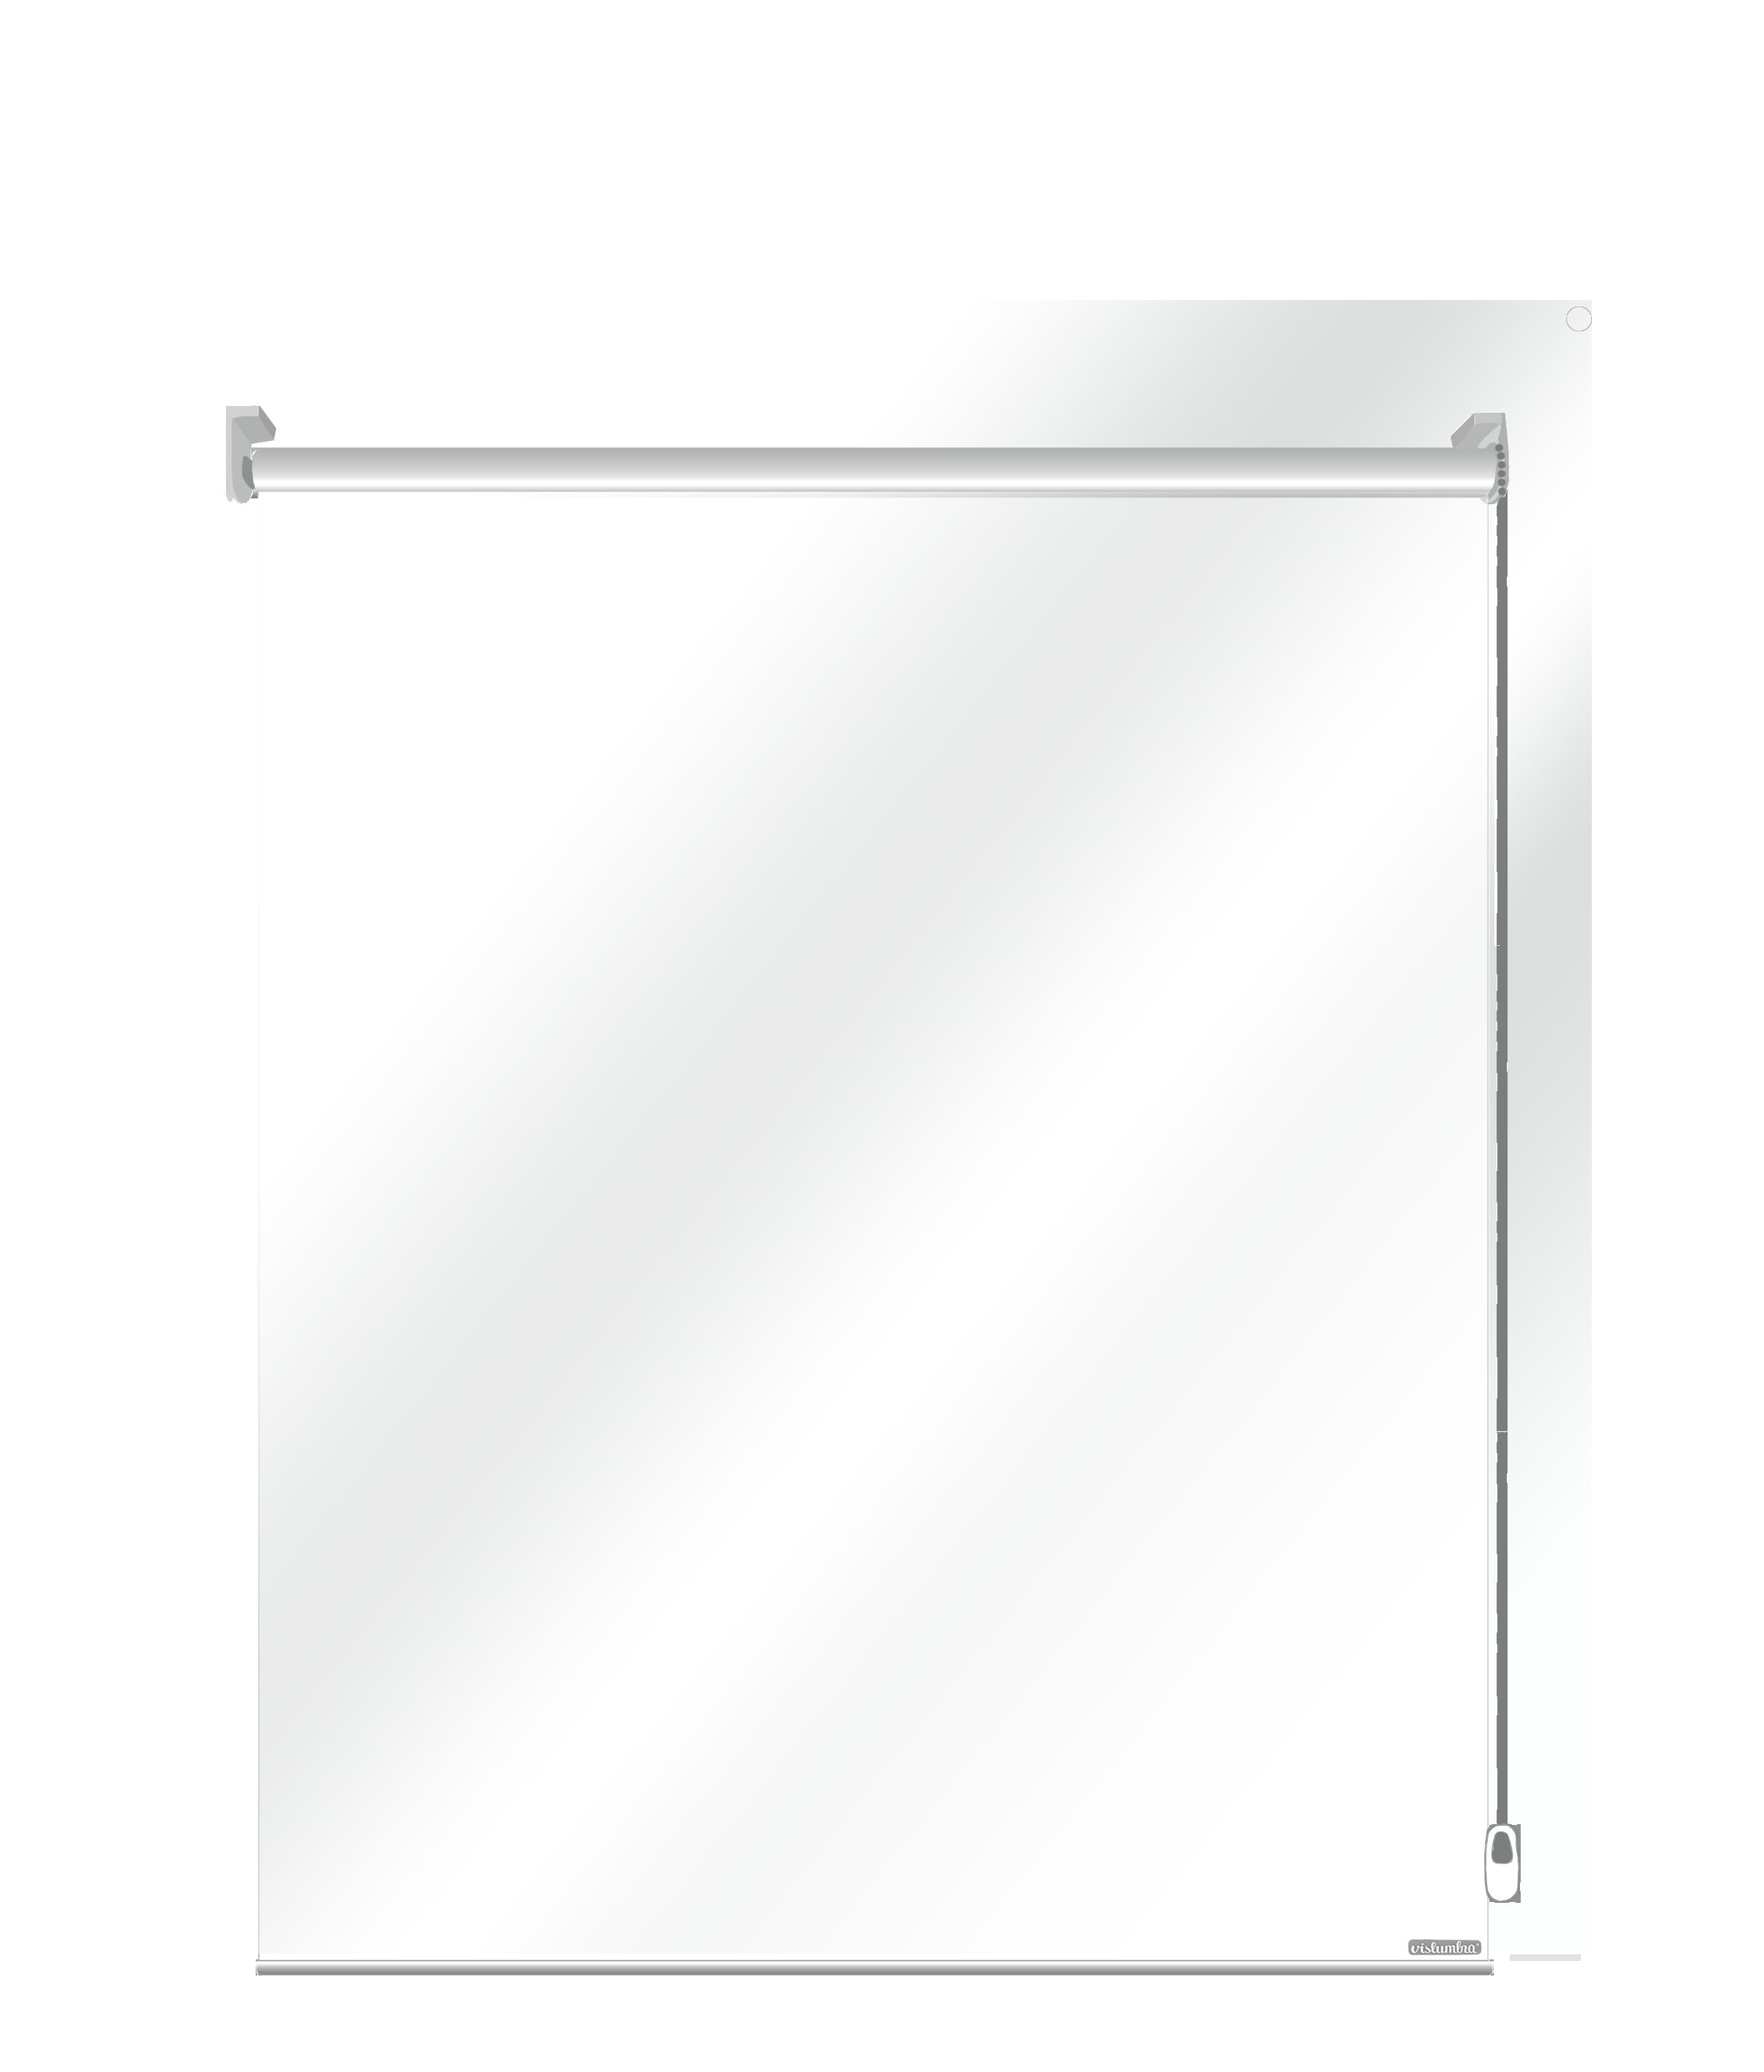 CleanGlass Vislumbra enrollable cadena